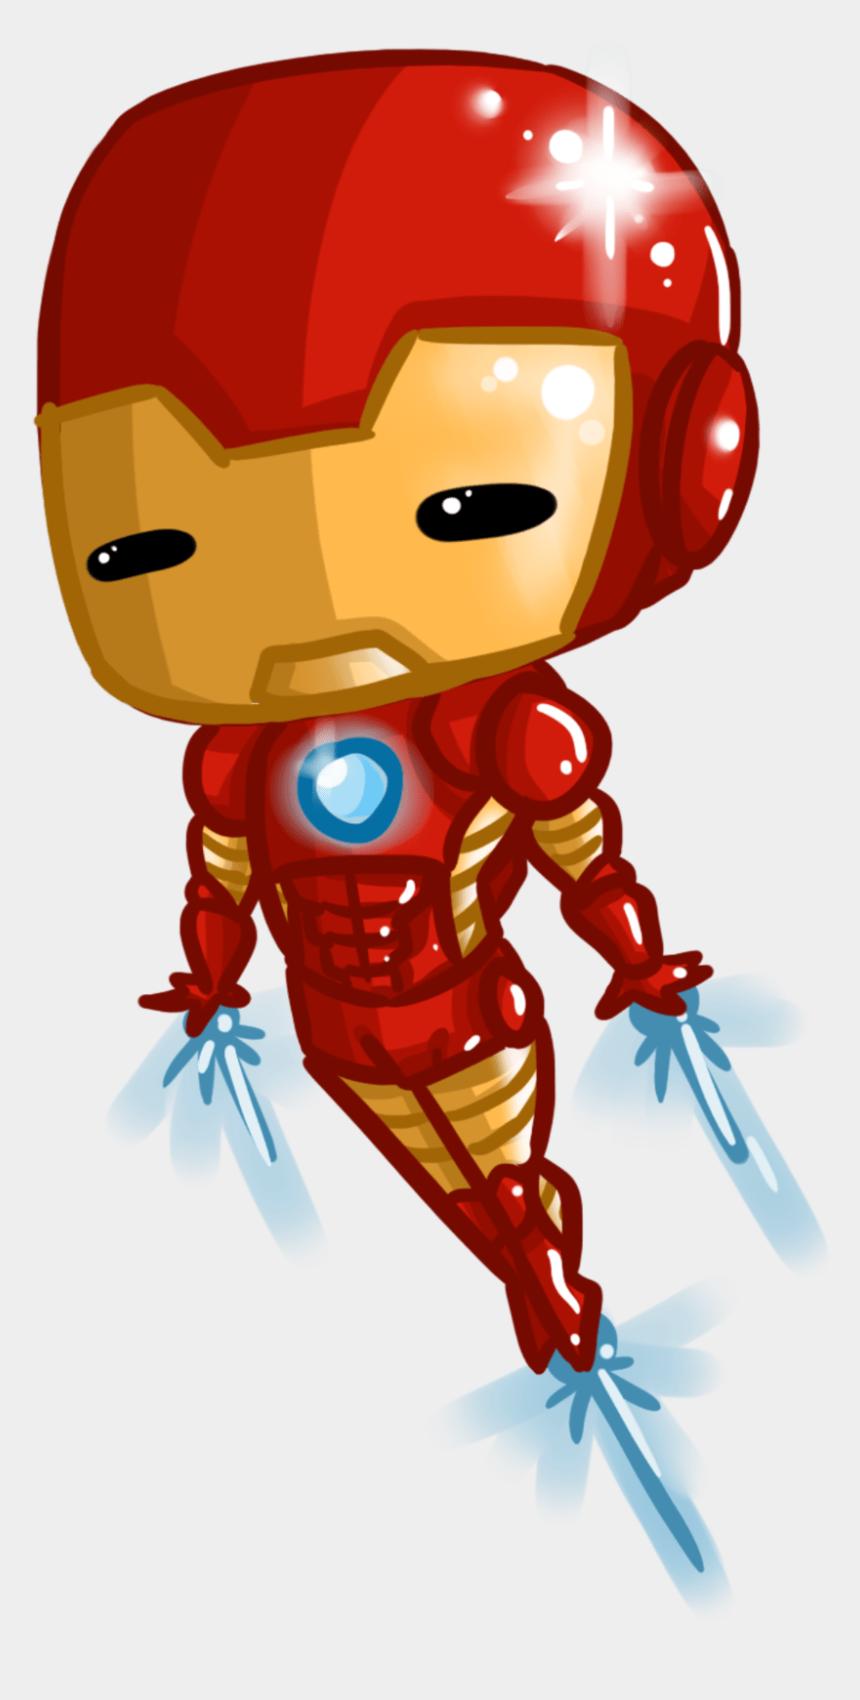 iron man clipart, Cartoons - Iron Man Tony Stark Chibi - Cute Iron Man Clipart